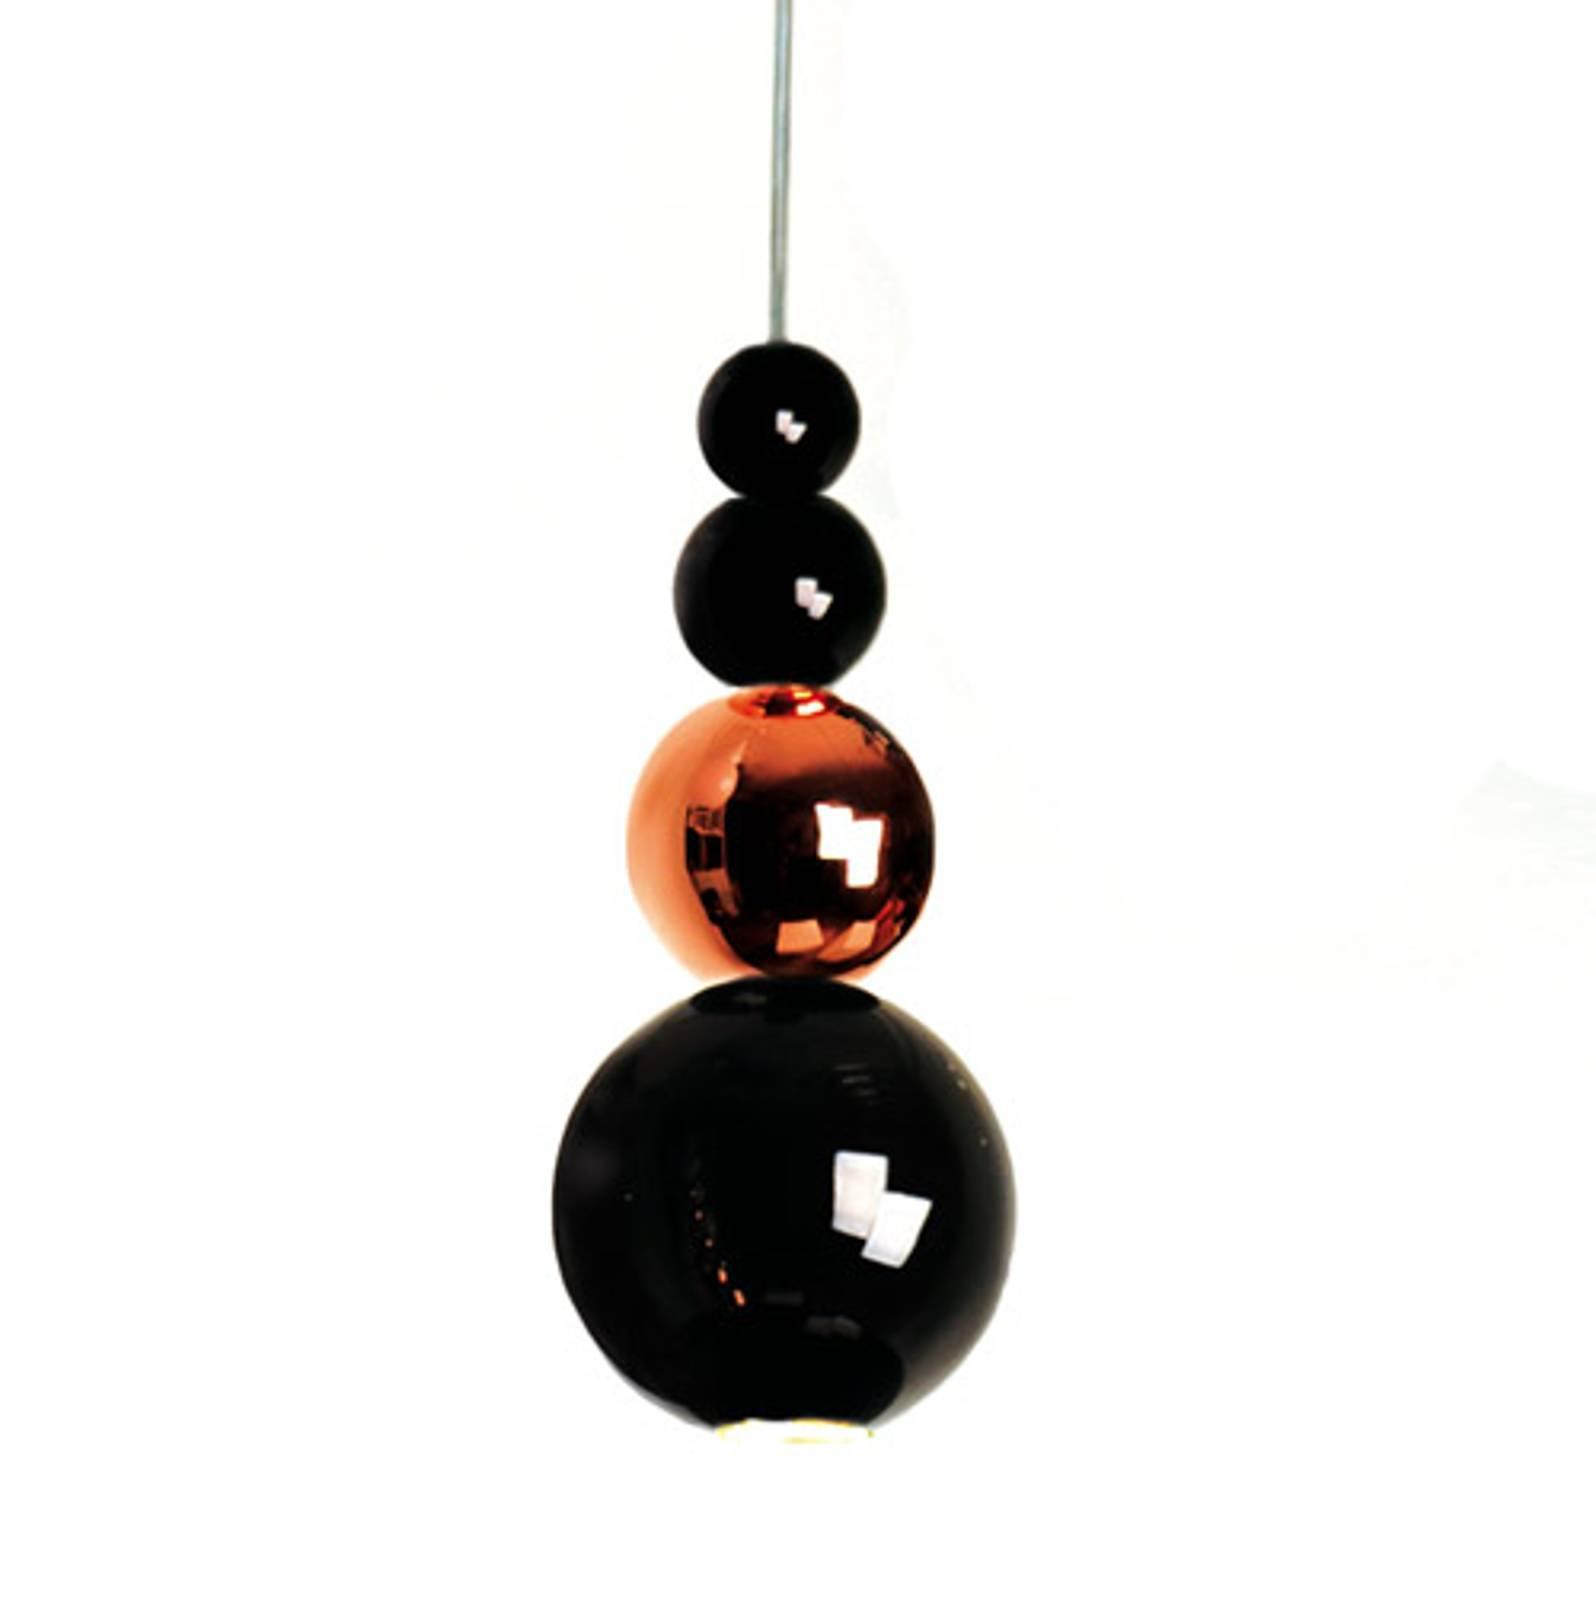 Innermost Bubble - hanglamp in zwart-koper